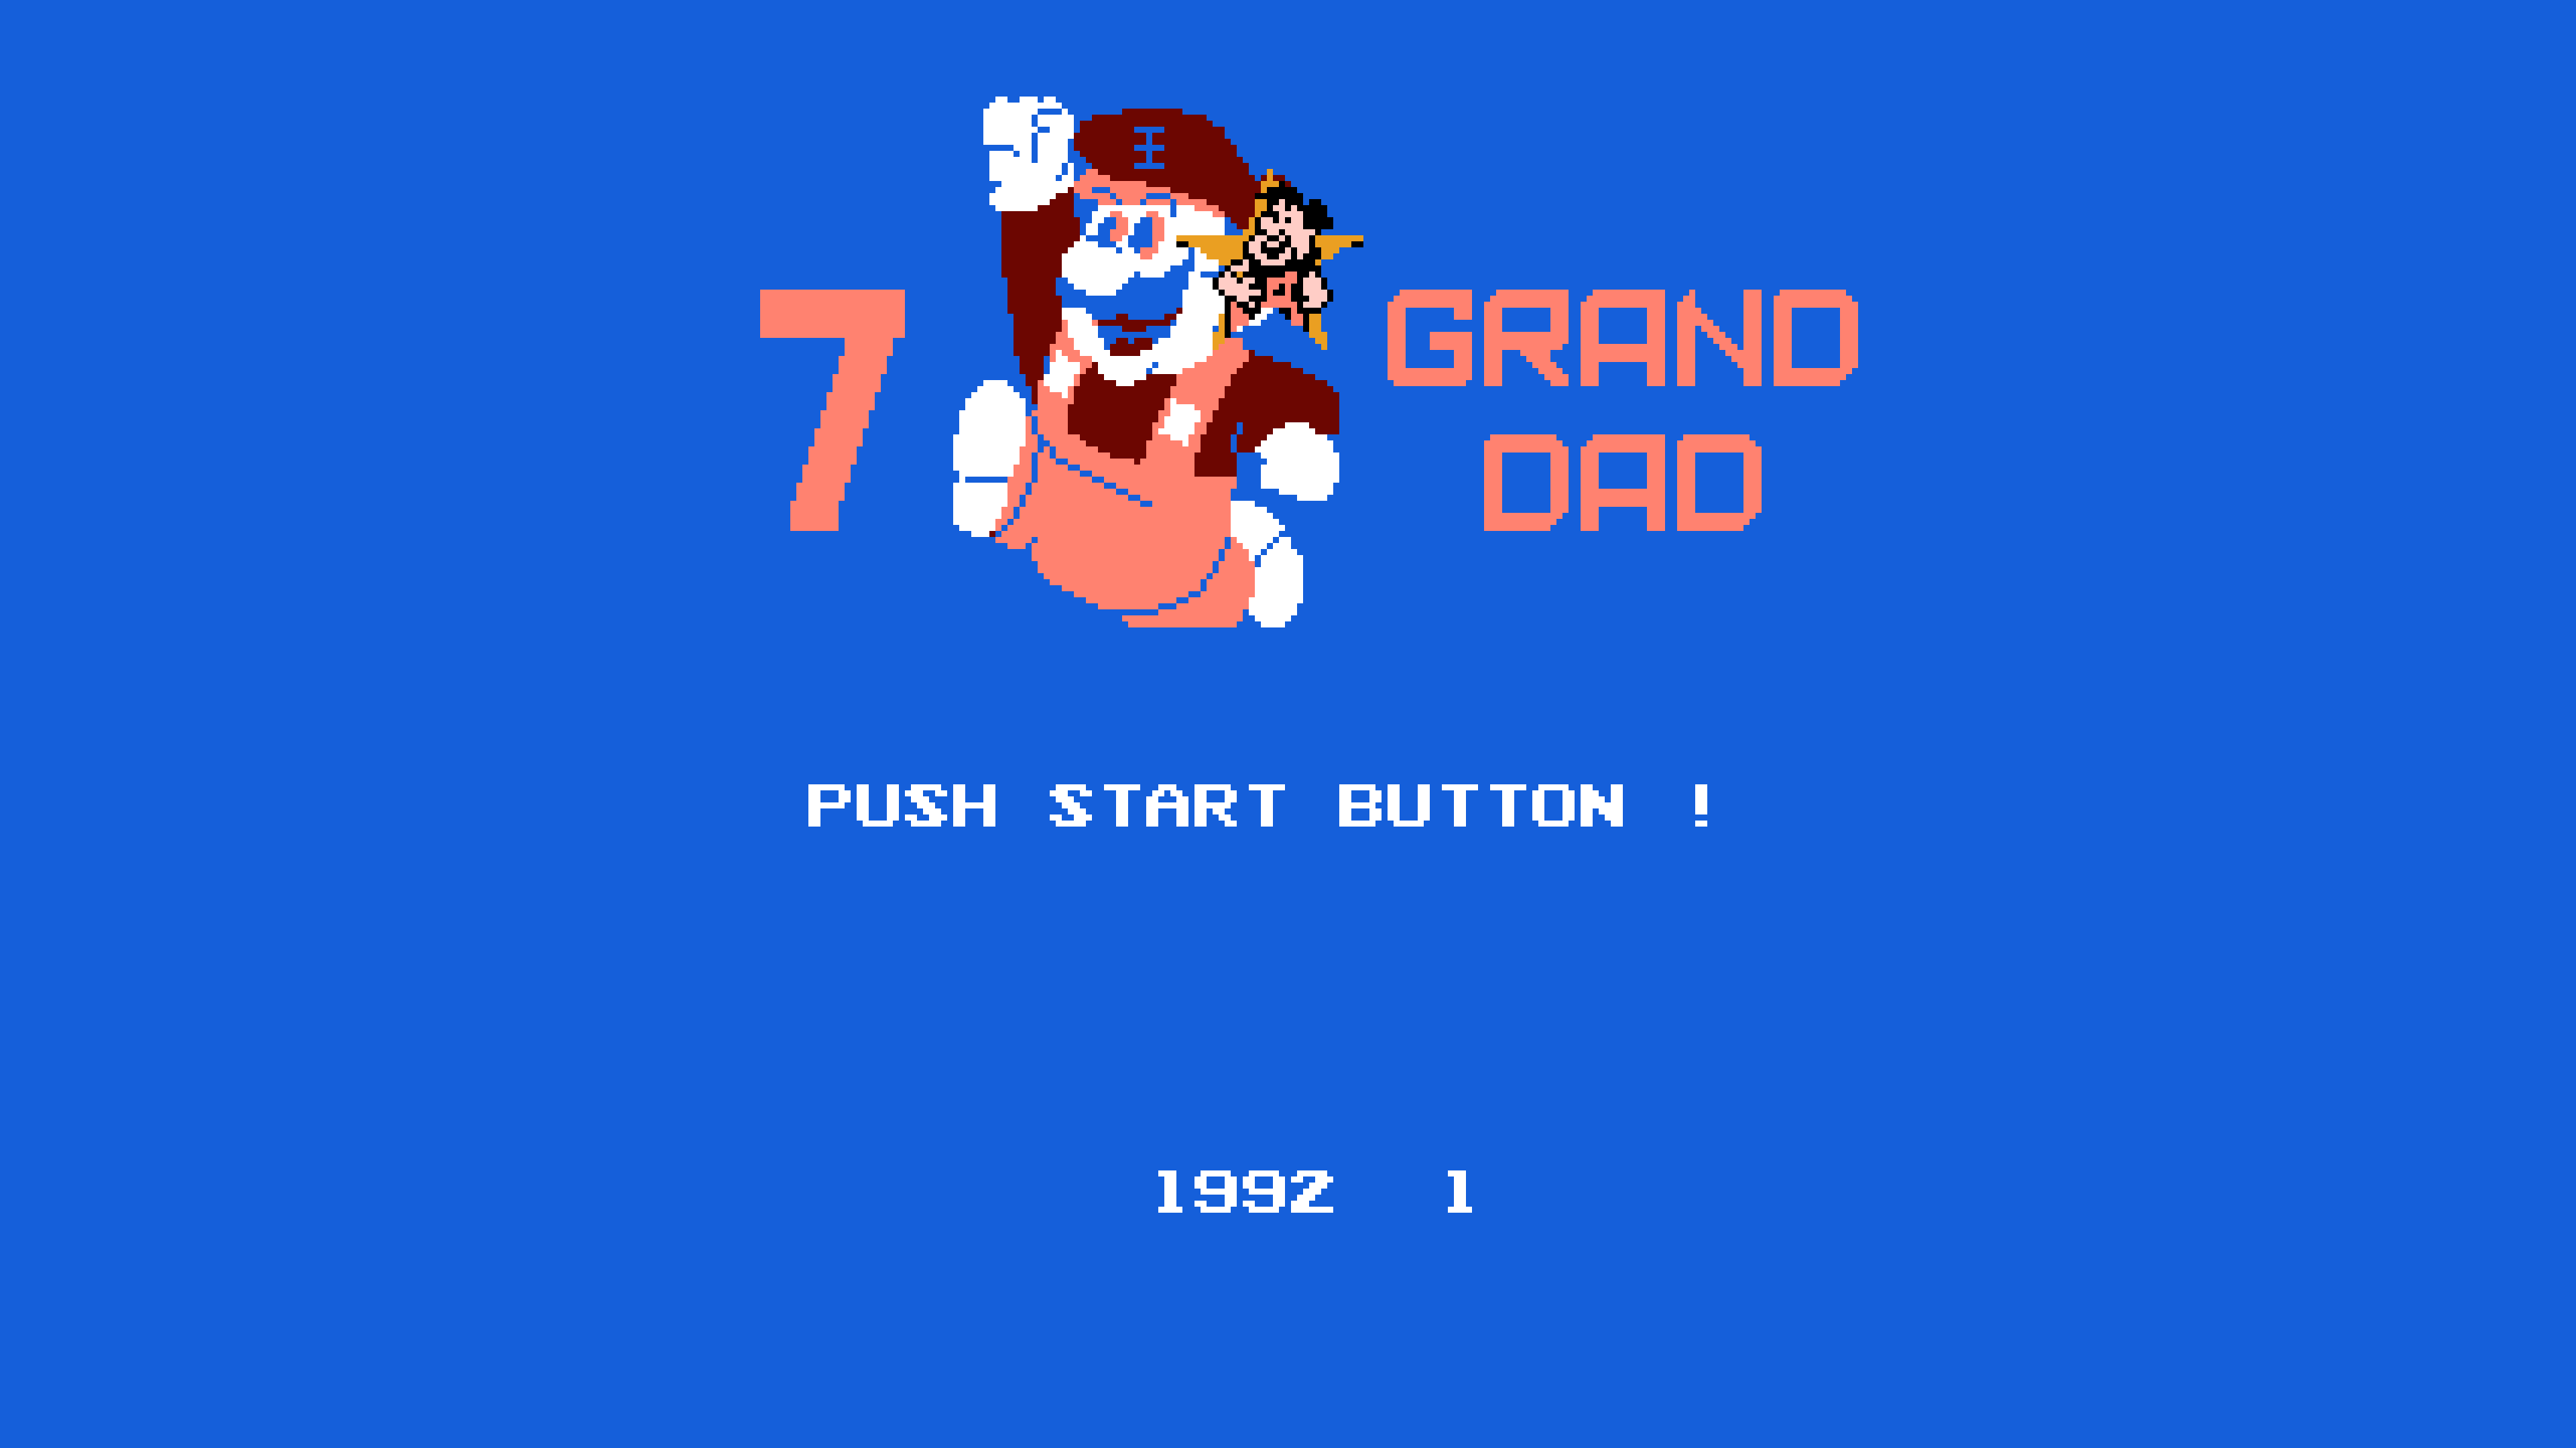 Title Theme - 7 GRAND DAD